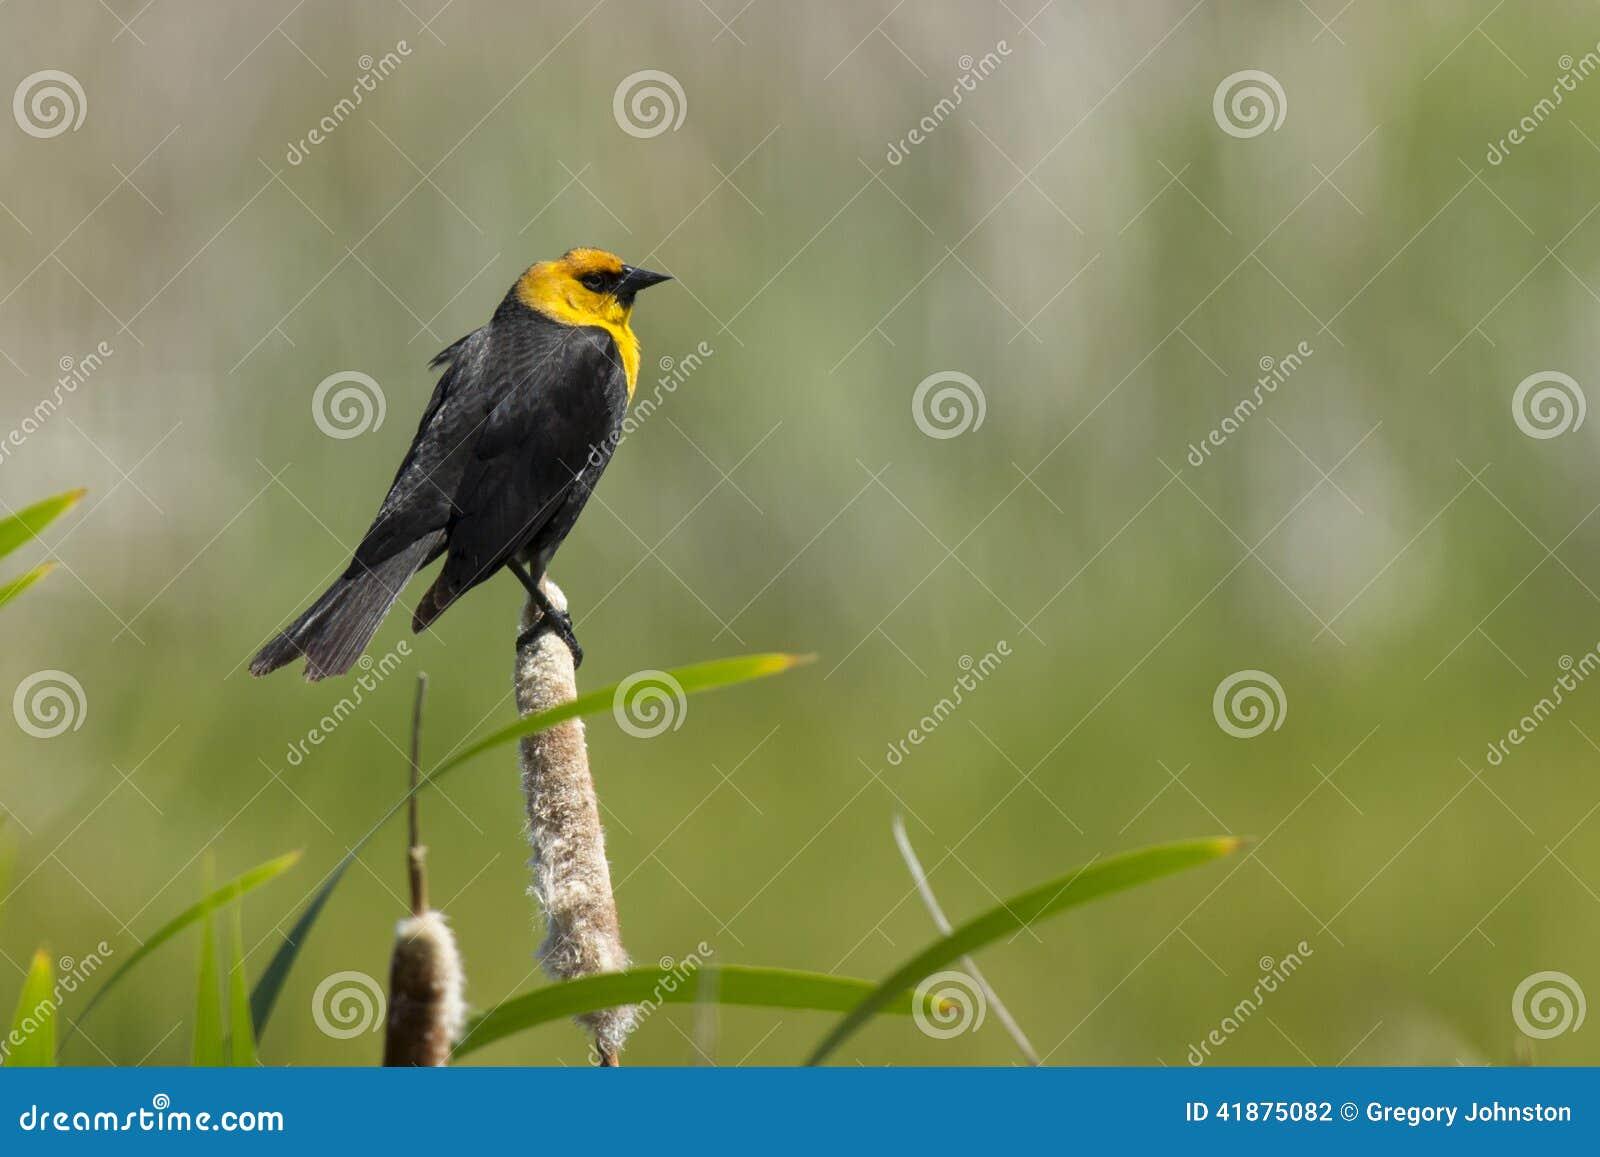 Yellow Headed Blackbird Range Yellow headed blackbird